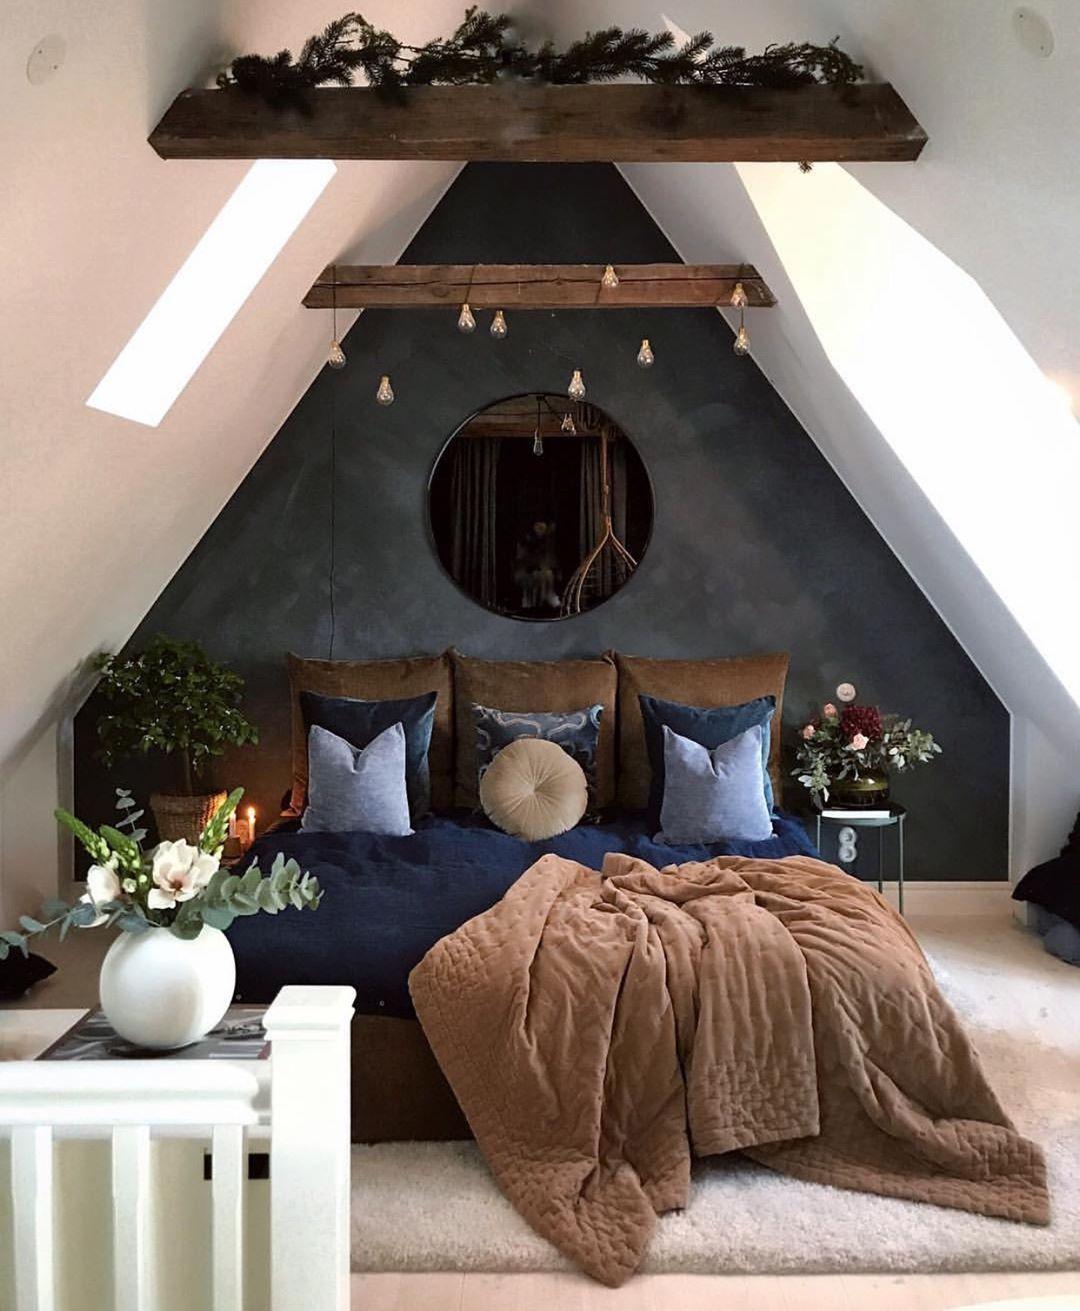 How Gorgeous Is This Attic Bedroom By Hannasanglar Good Night All Bedroom Bedroomdecor Bed Sovevaerelsesindretning Sovevaerelsesideer Drommevaerelser